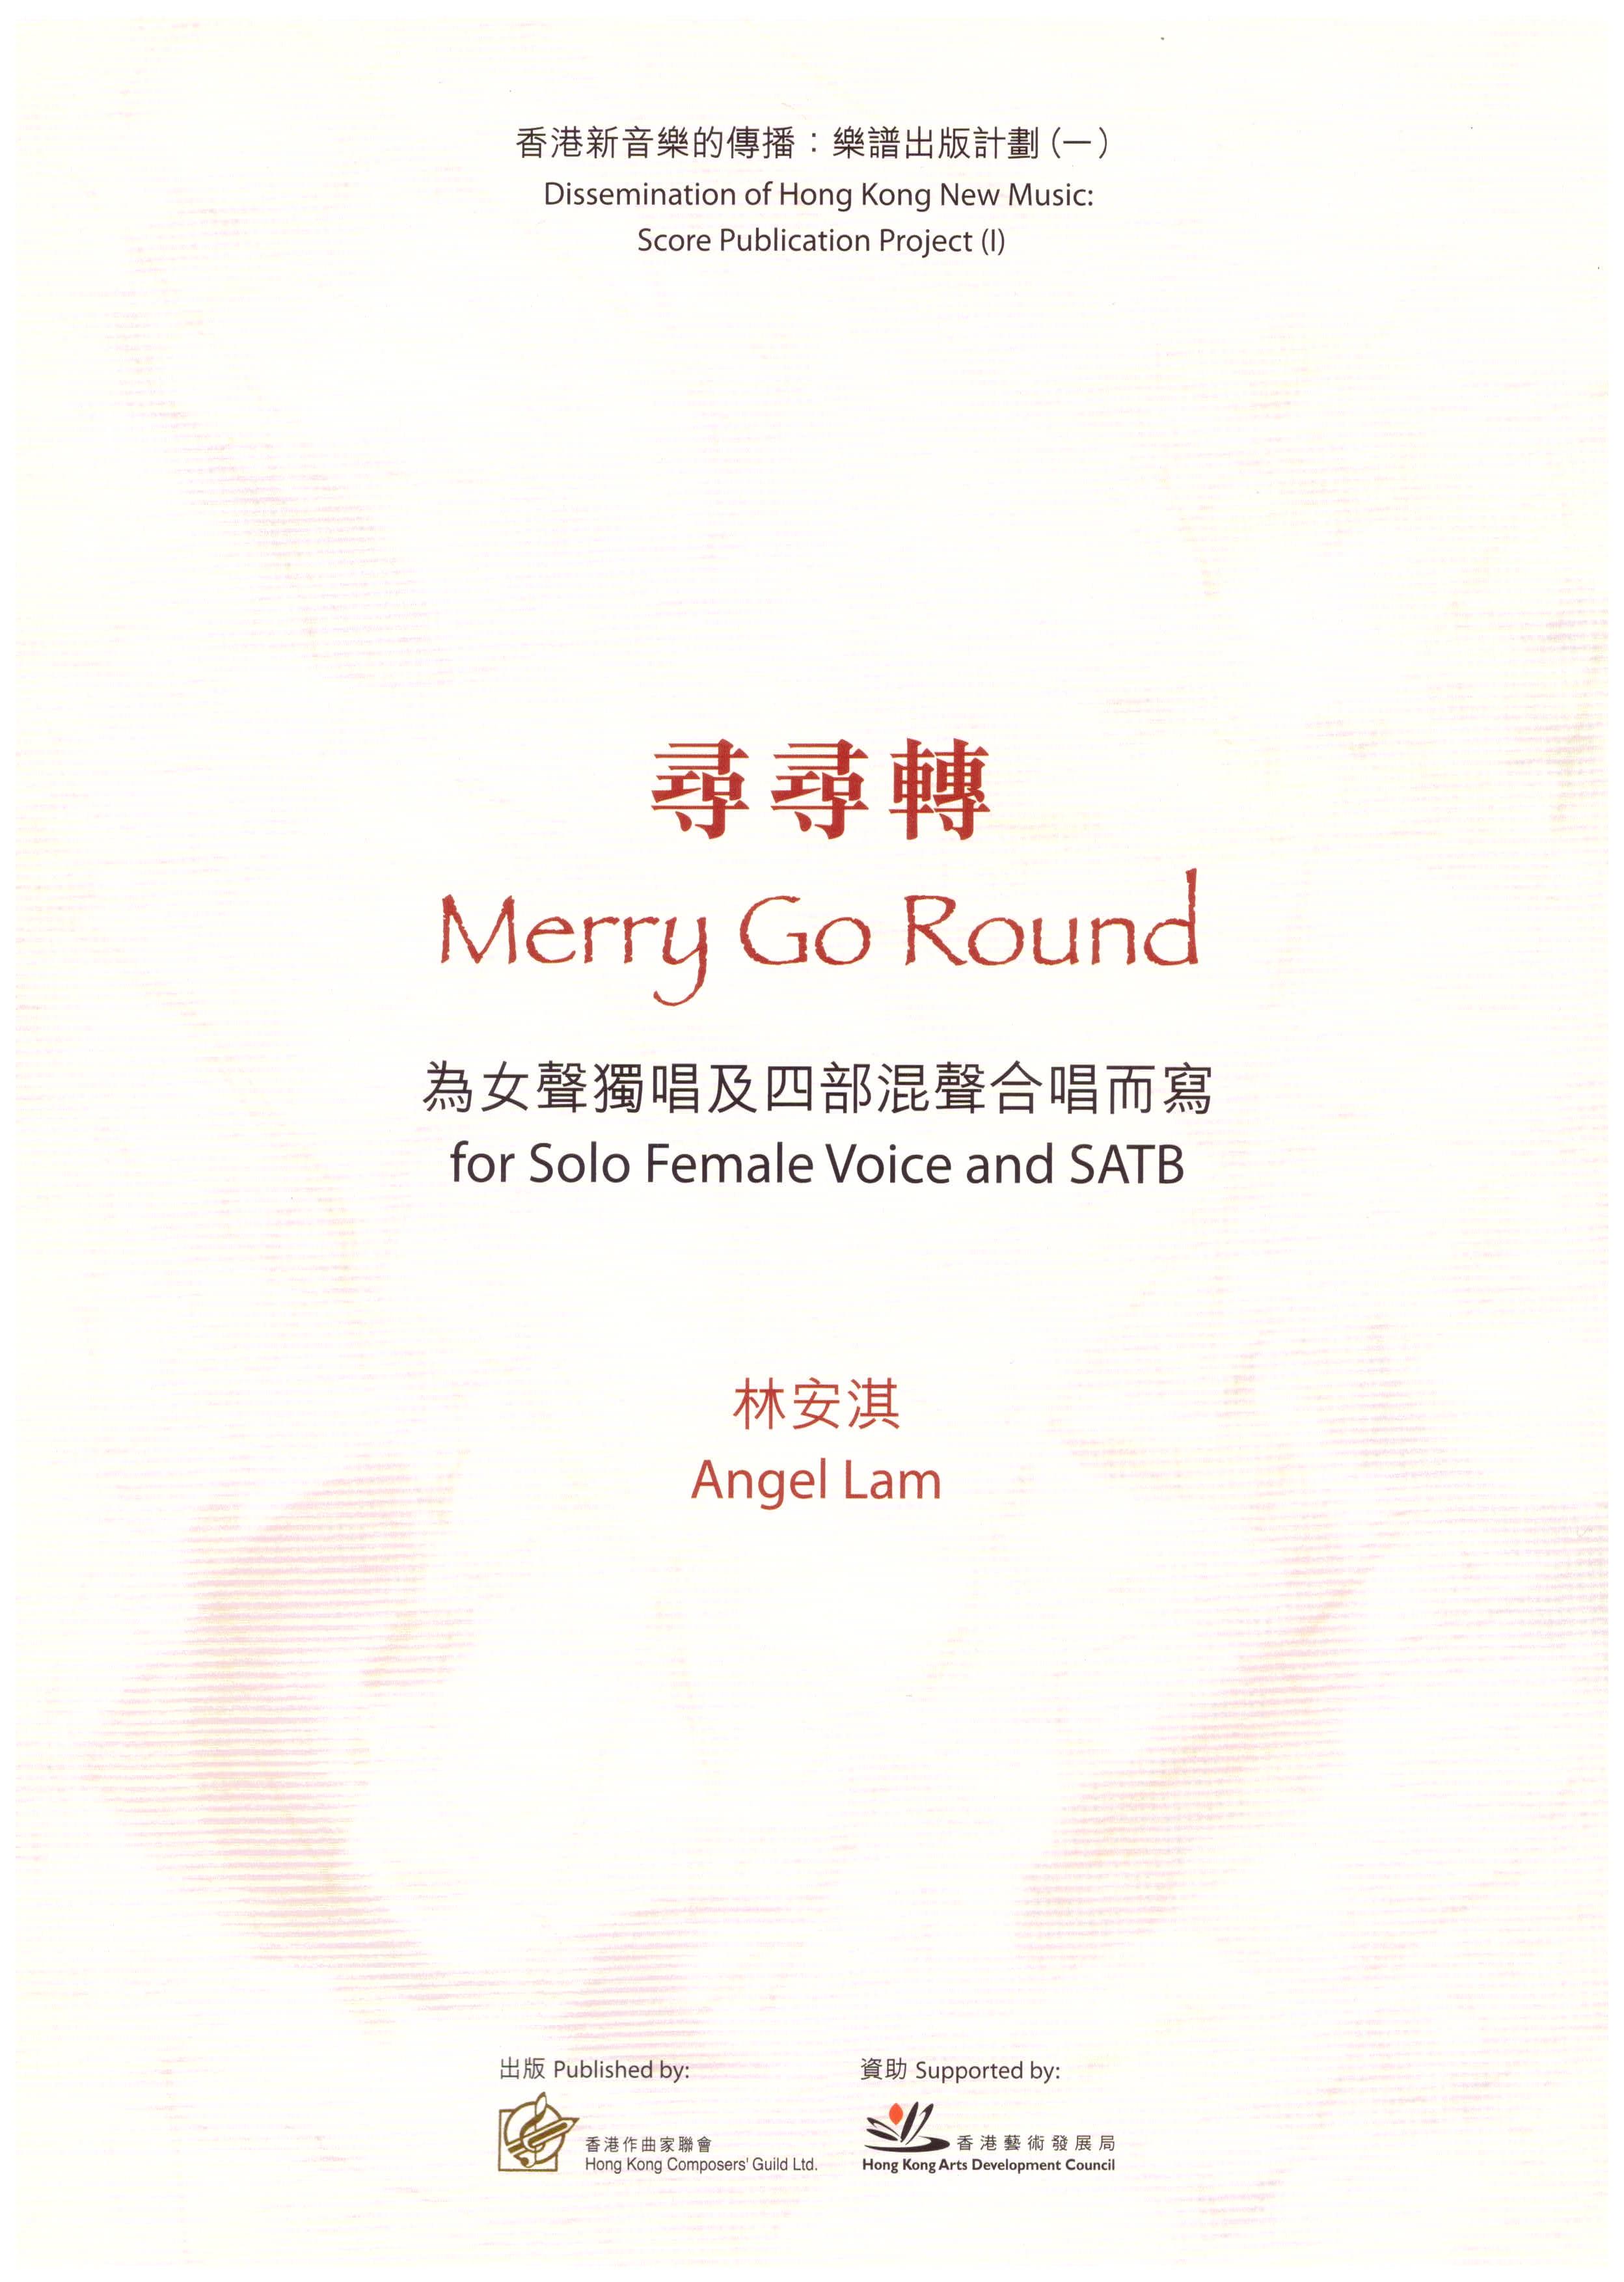 Angel Lam - Merry Go Round